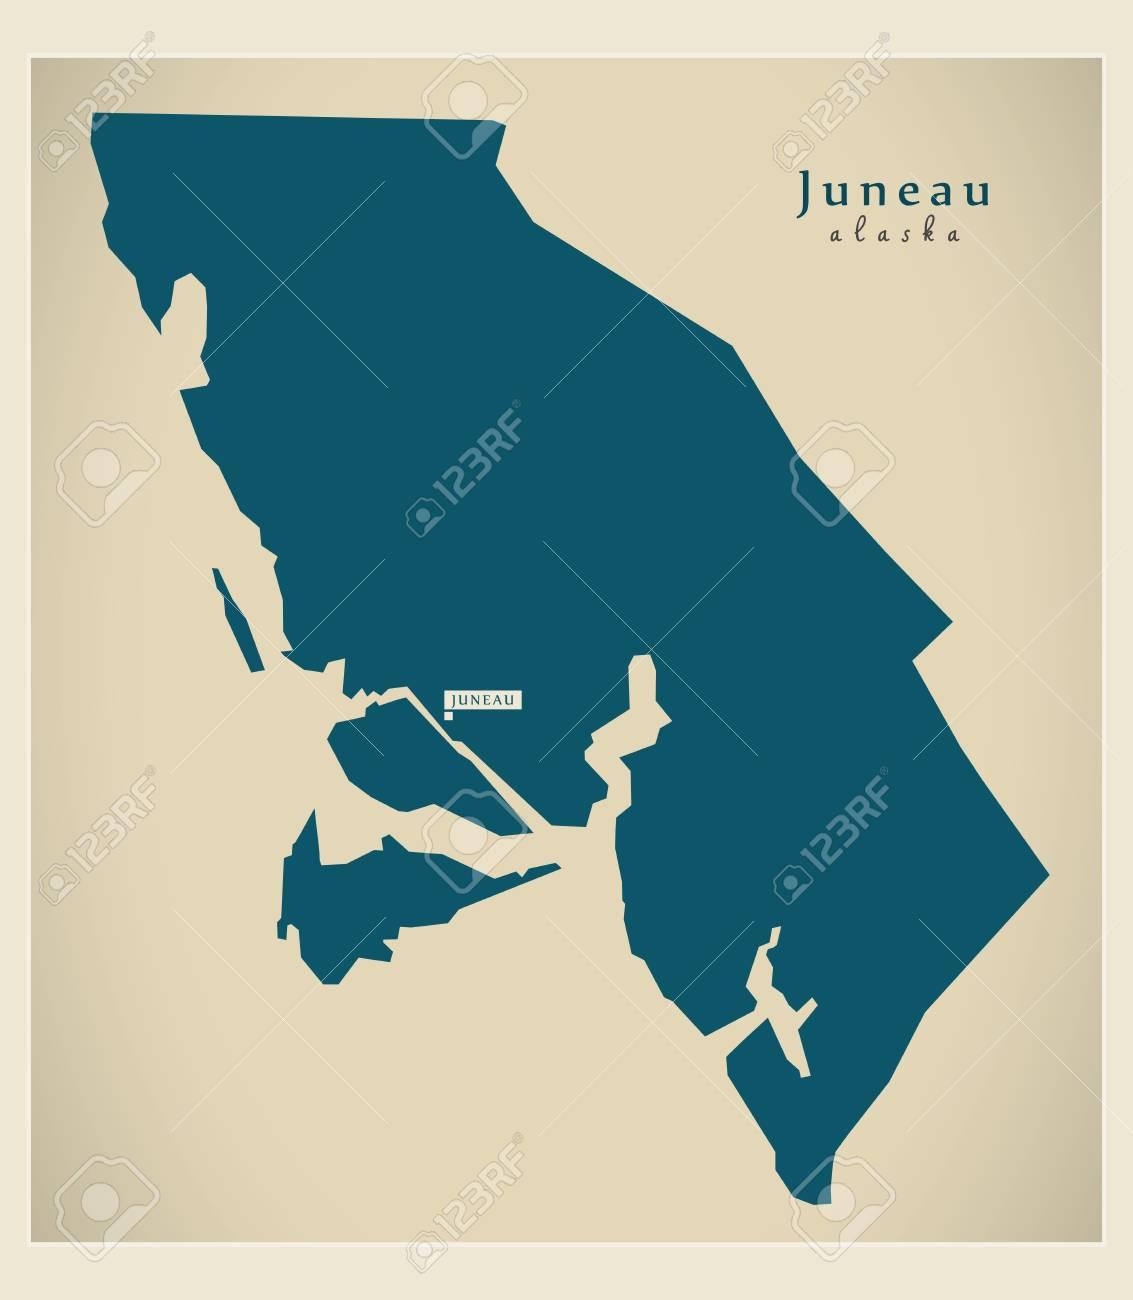 Modern Map - Juneau Alaska county USA illustration